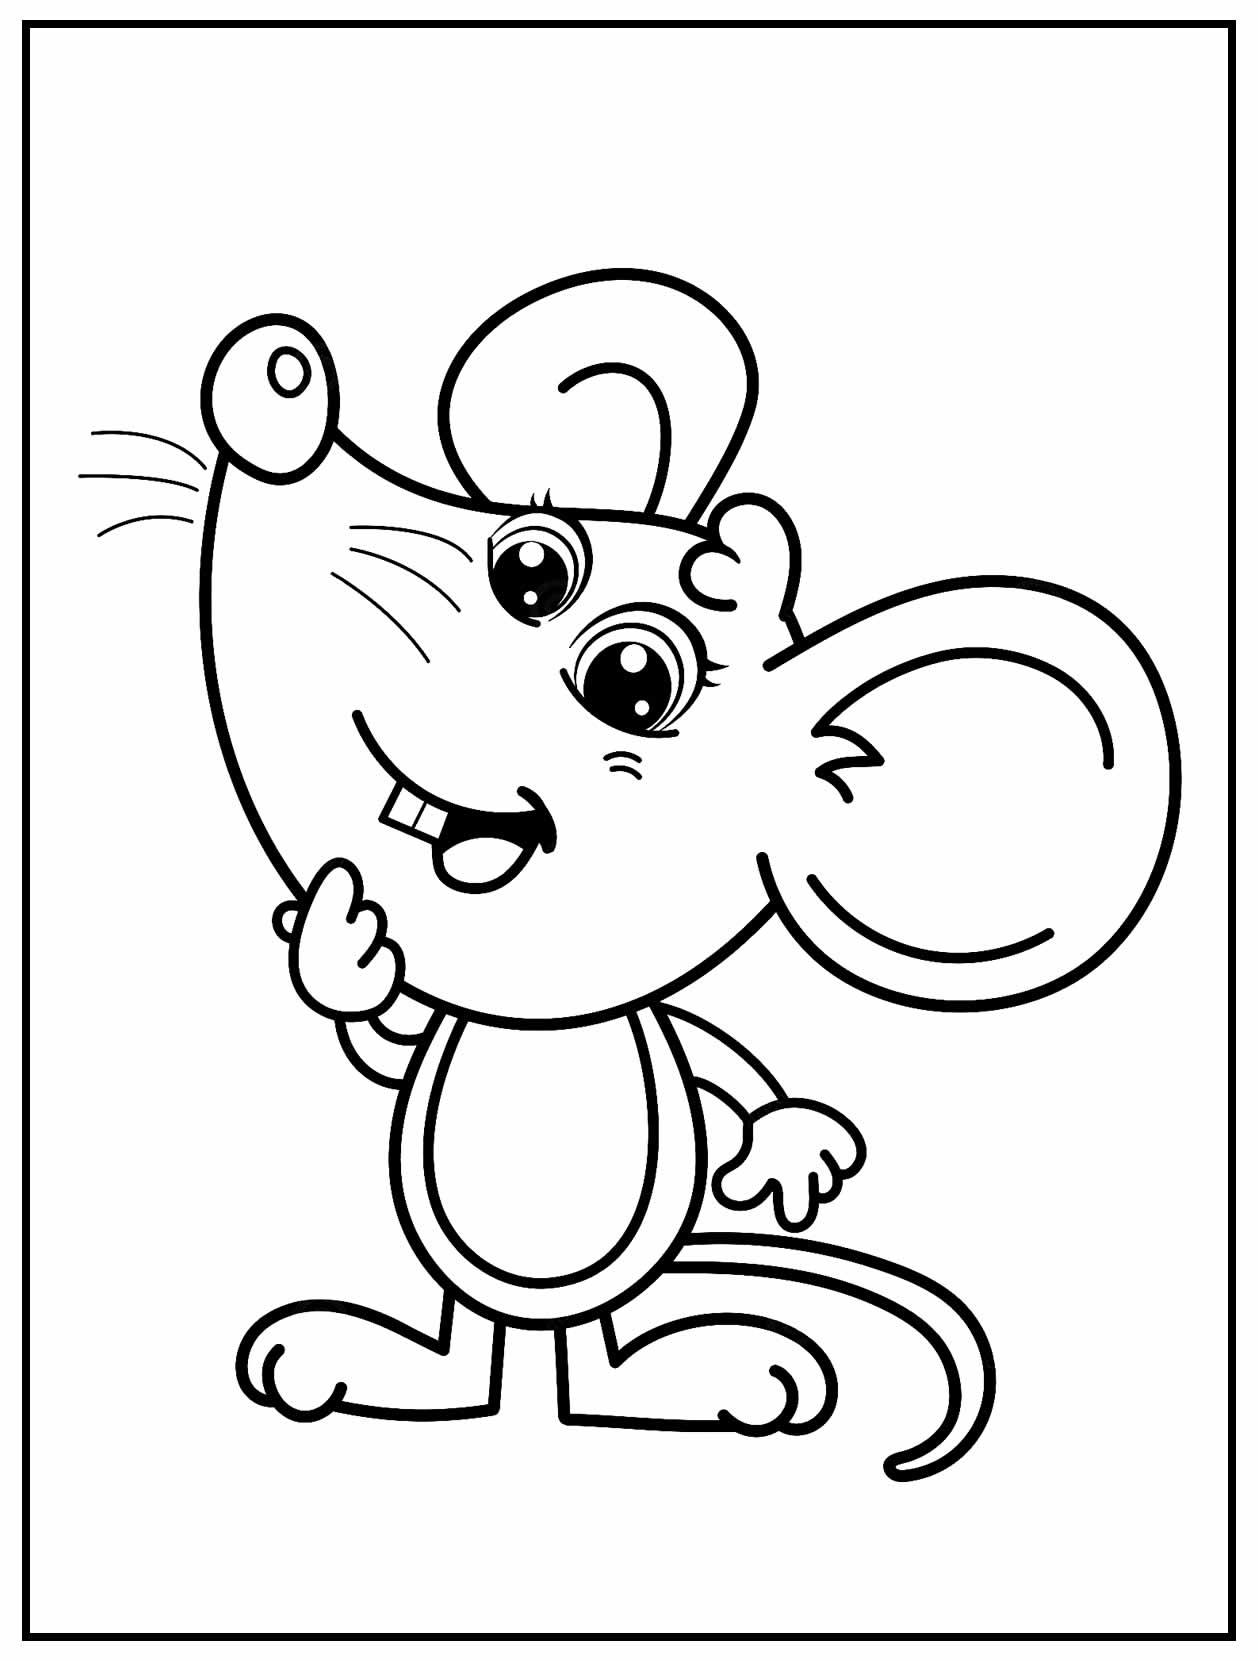 Página para colorir de Ratinho